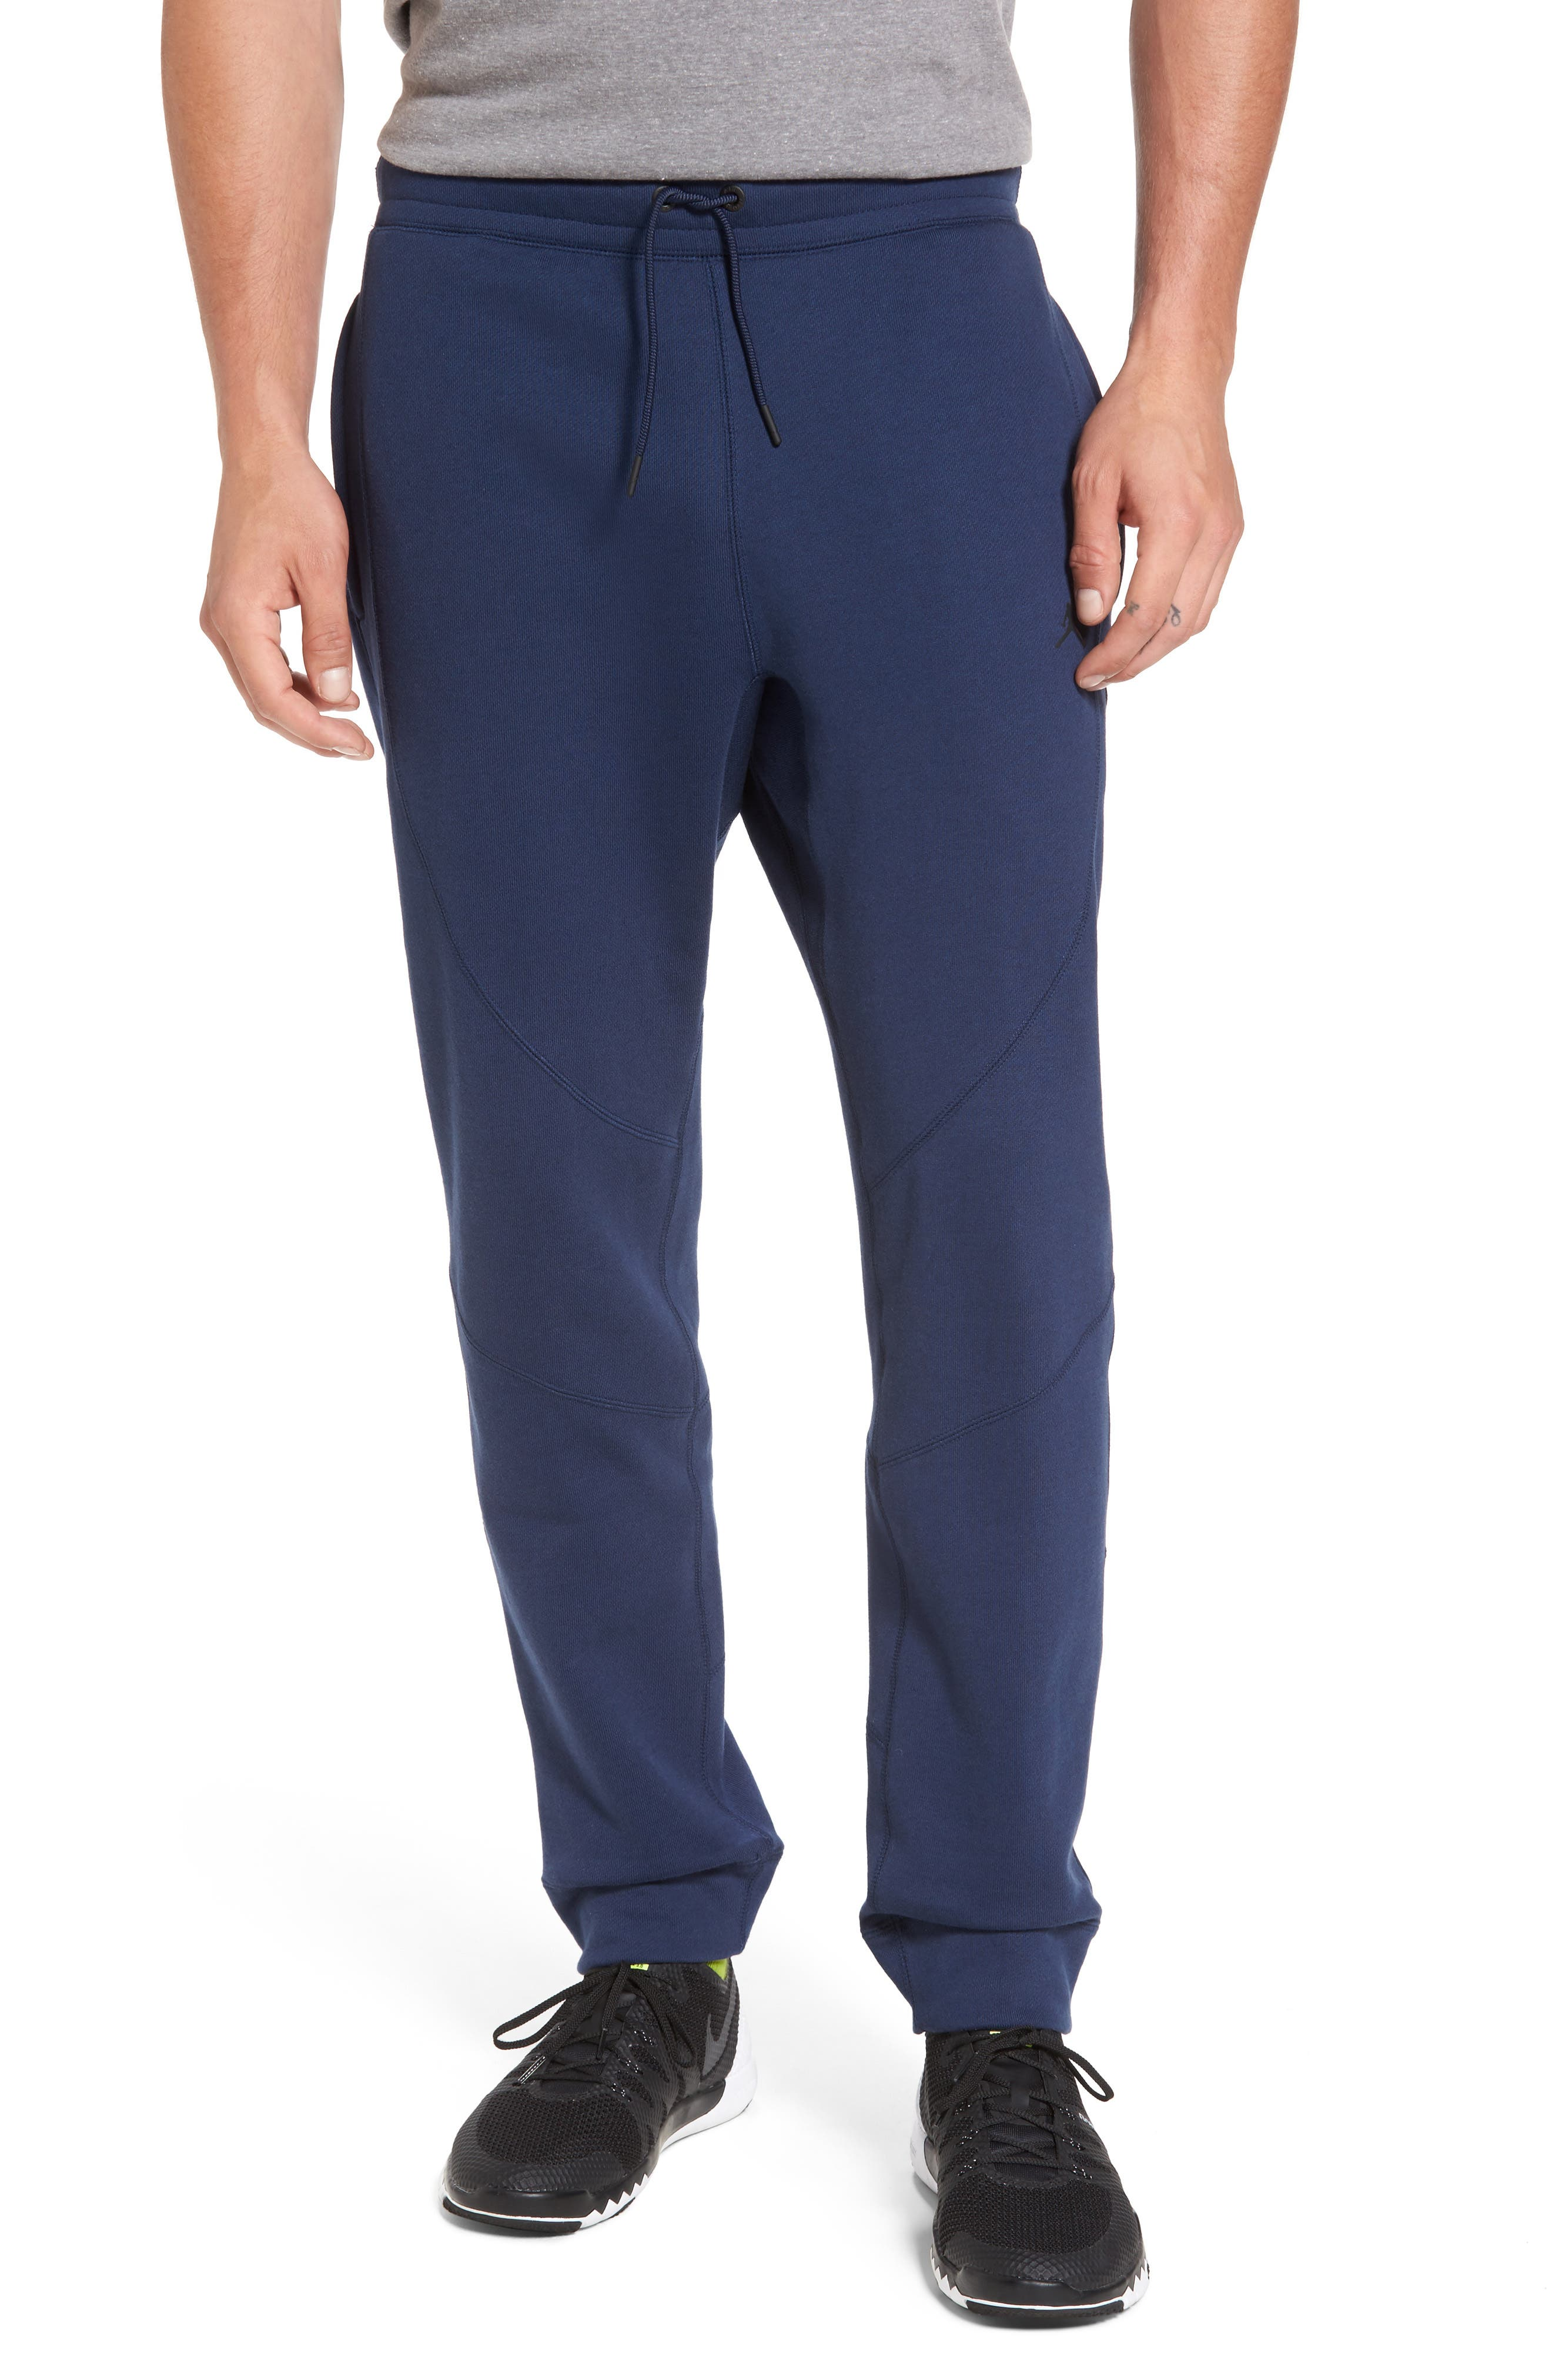 Alternate Image 1 Selected - Nike Jordan Wings Fleece Pants